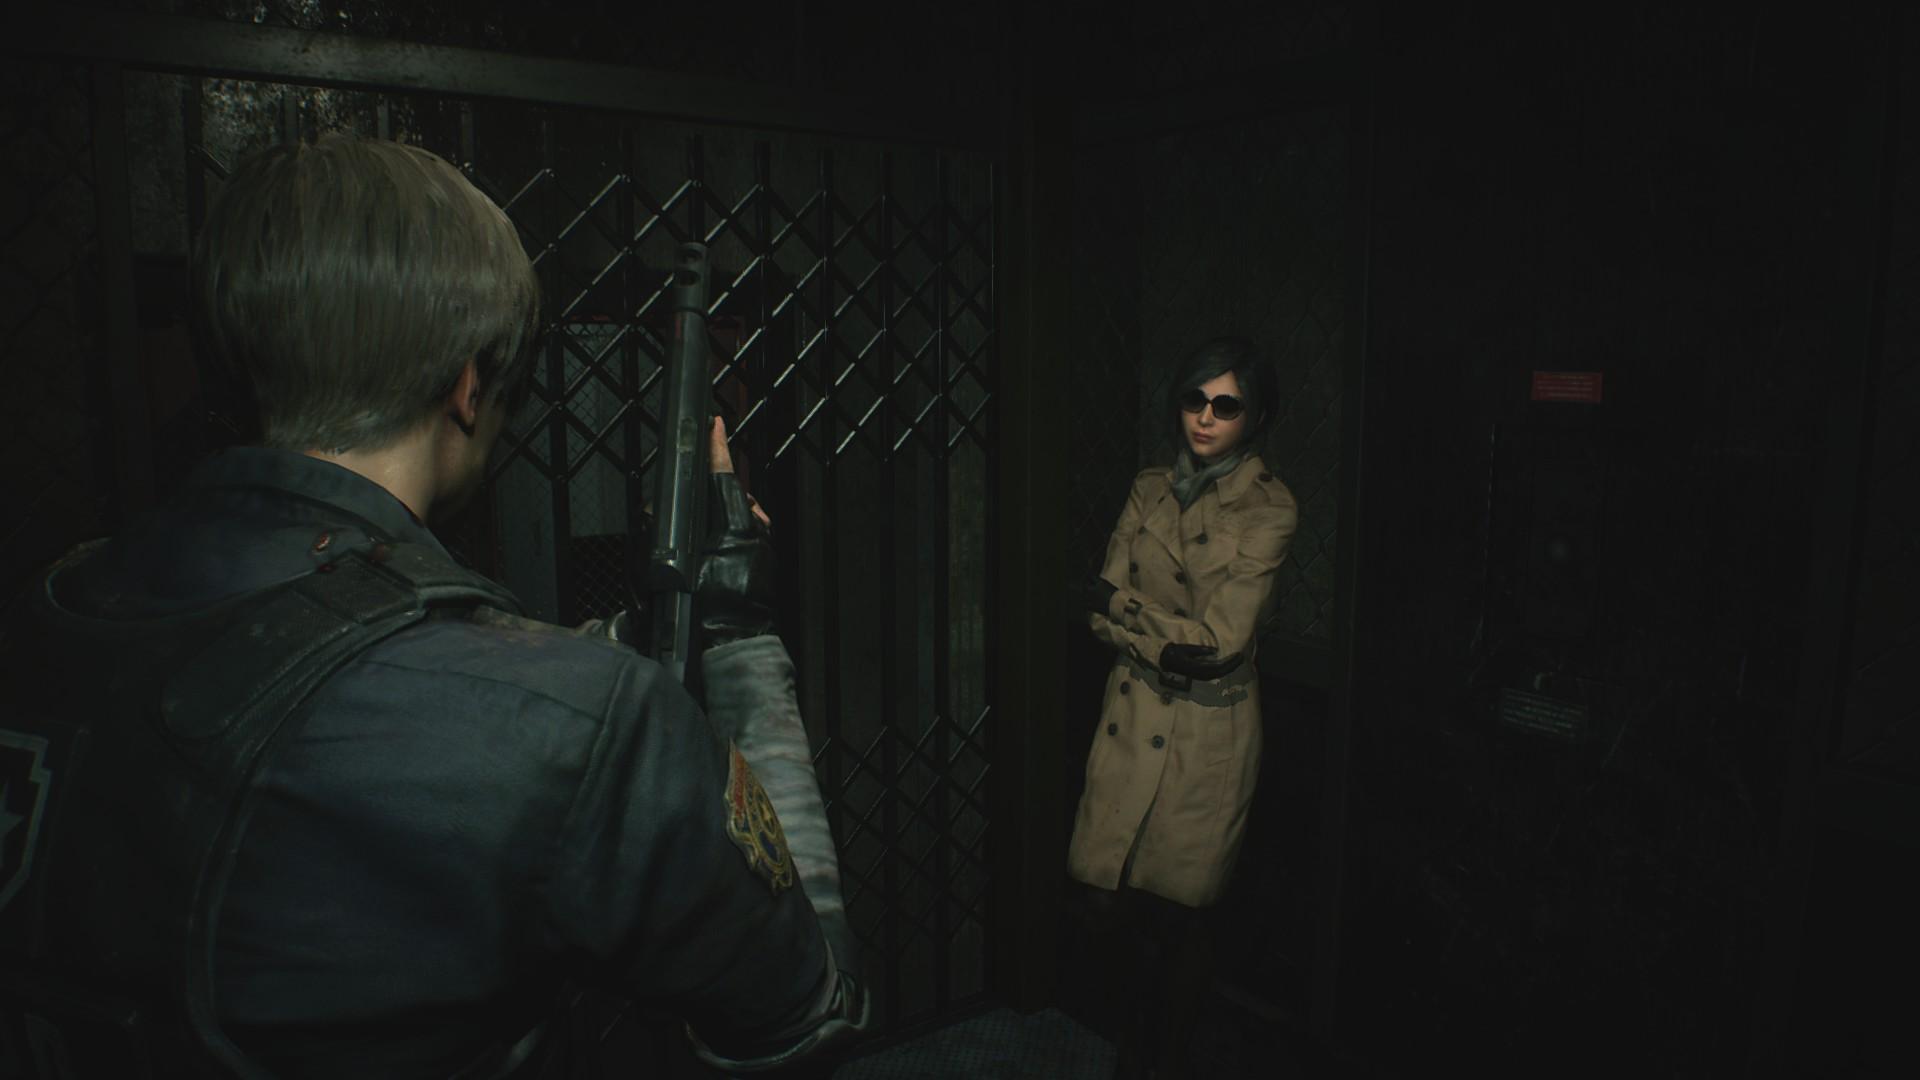 Обитель зла 2 прекрасен - Resident Evil 2